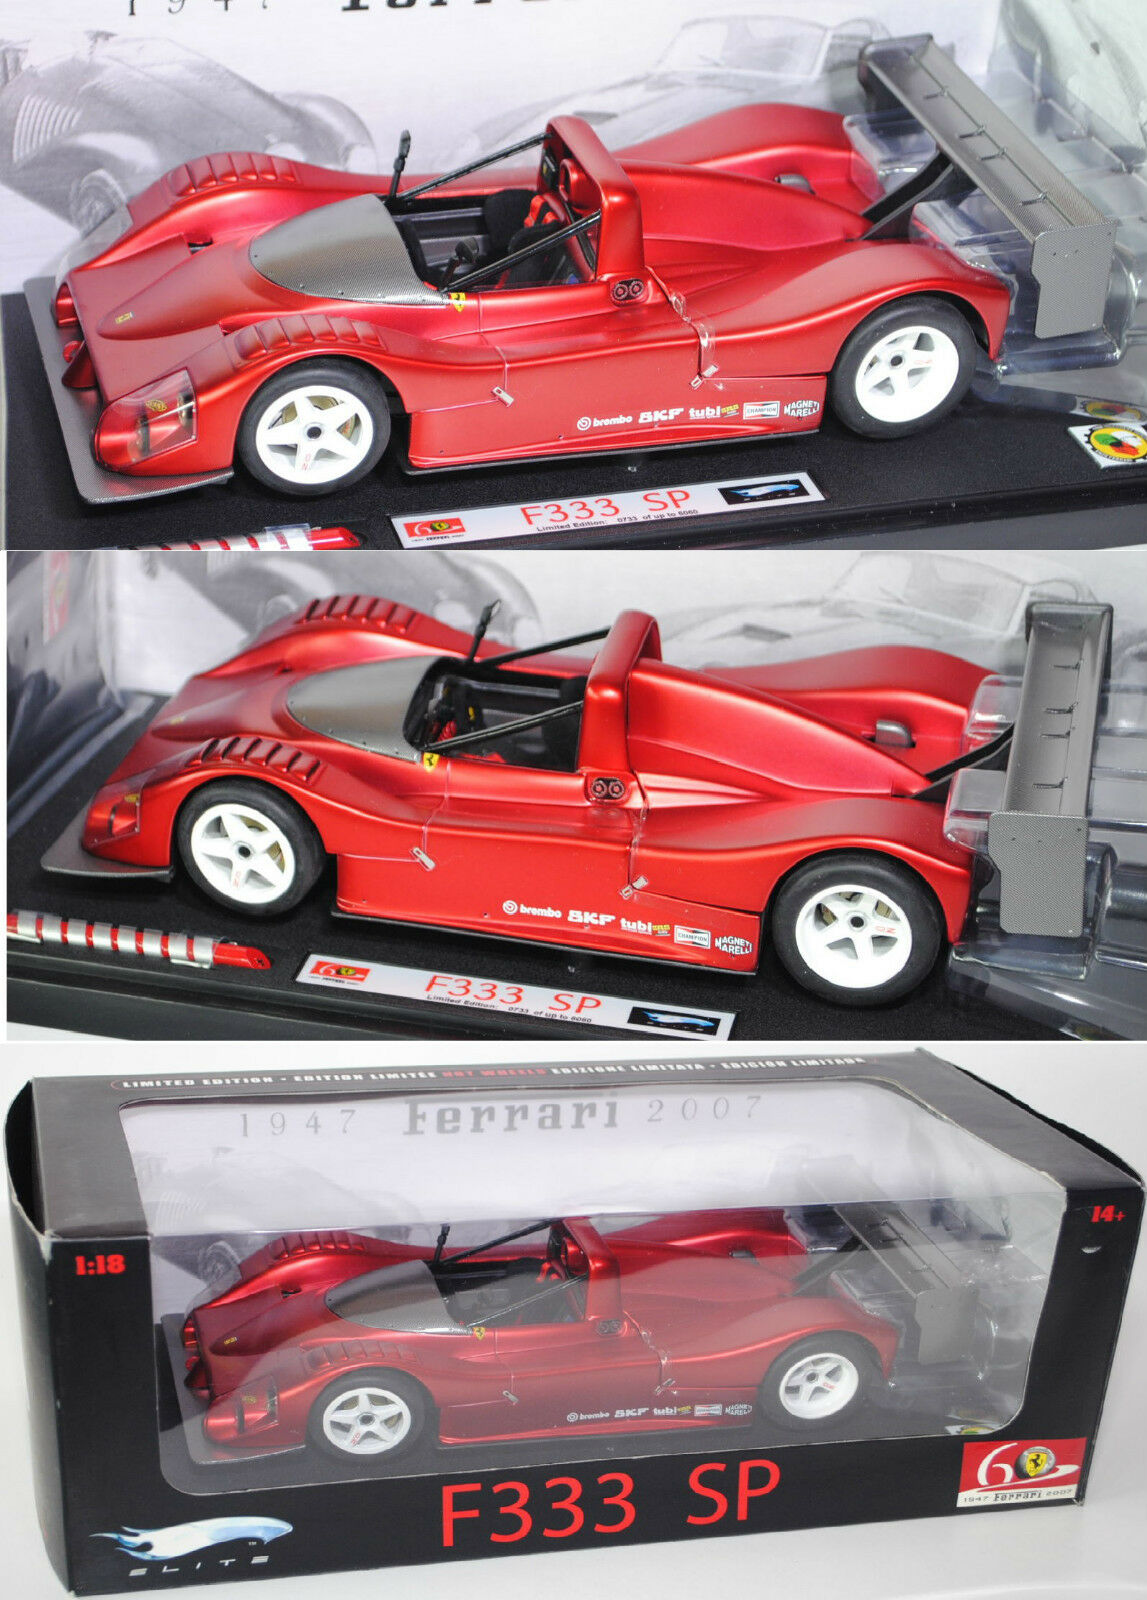 Elite l2975 Ferrari 333 SP, model 1994-2000, Red Metallic, 1 18, OVP